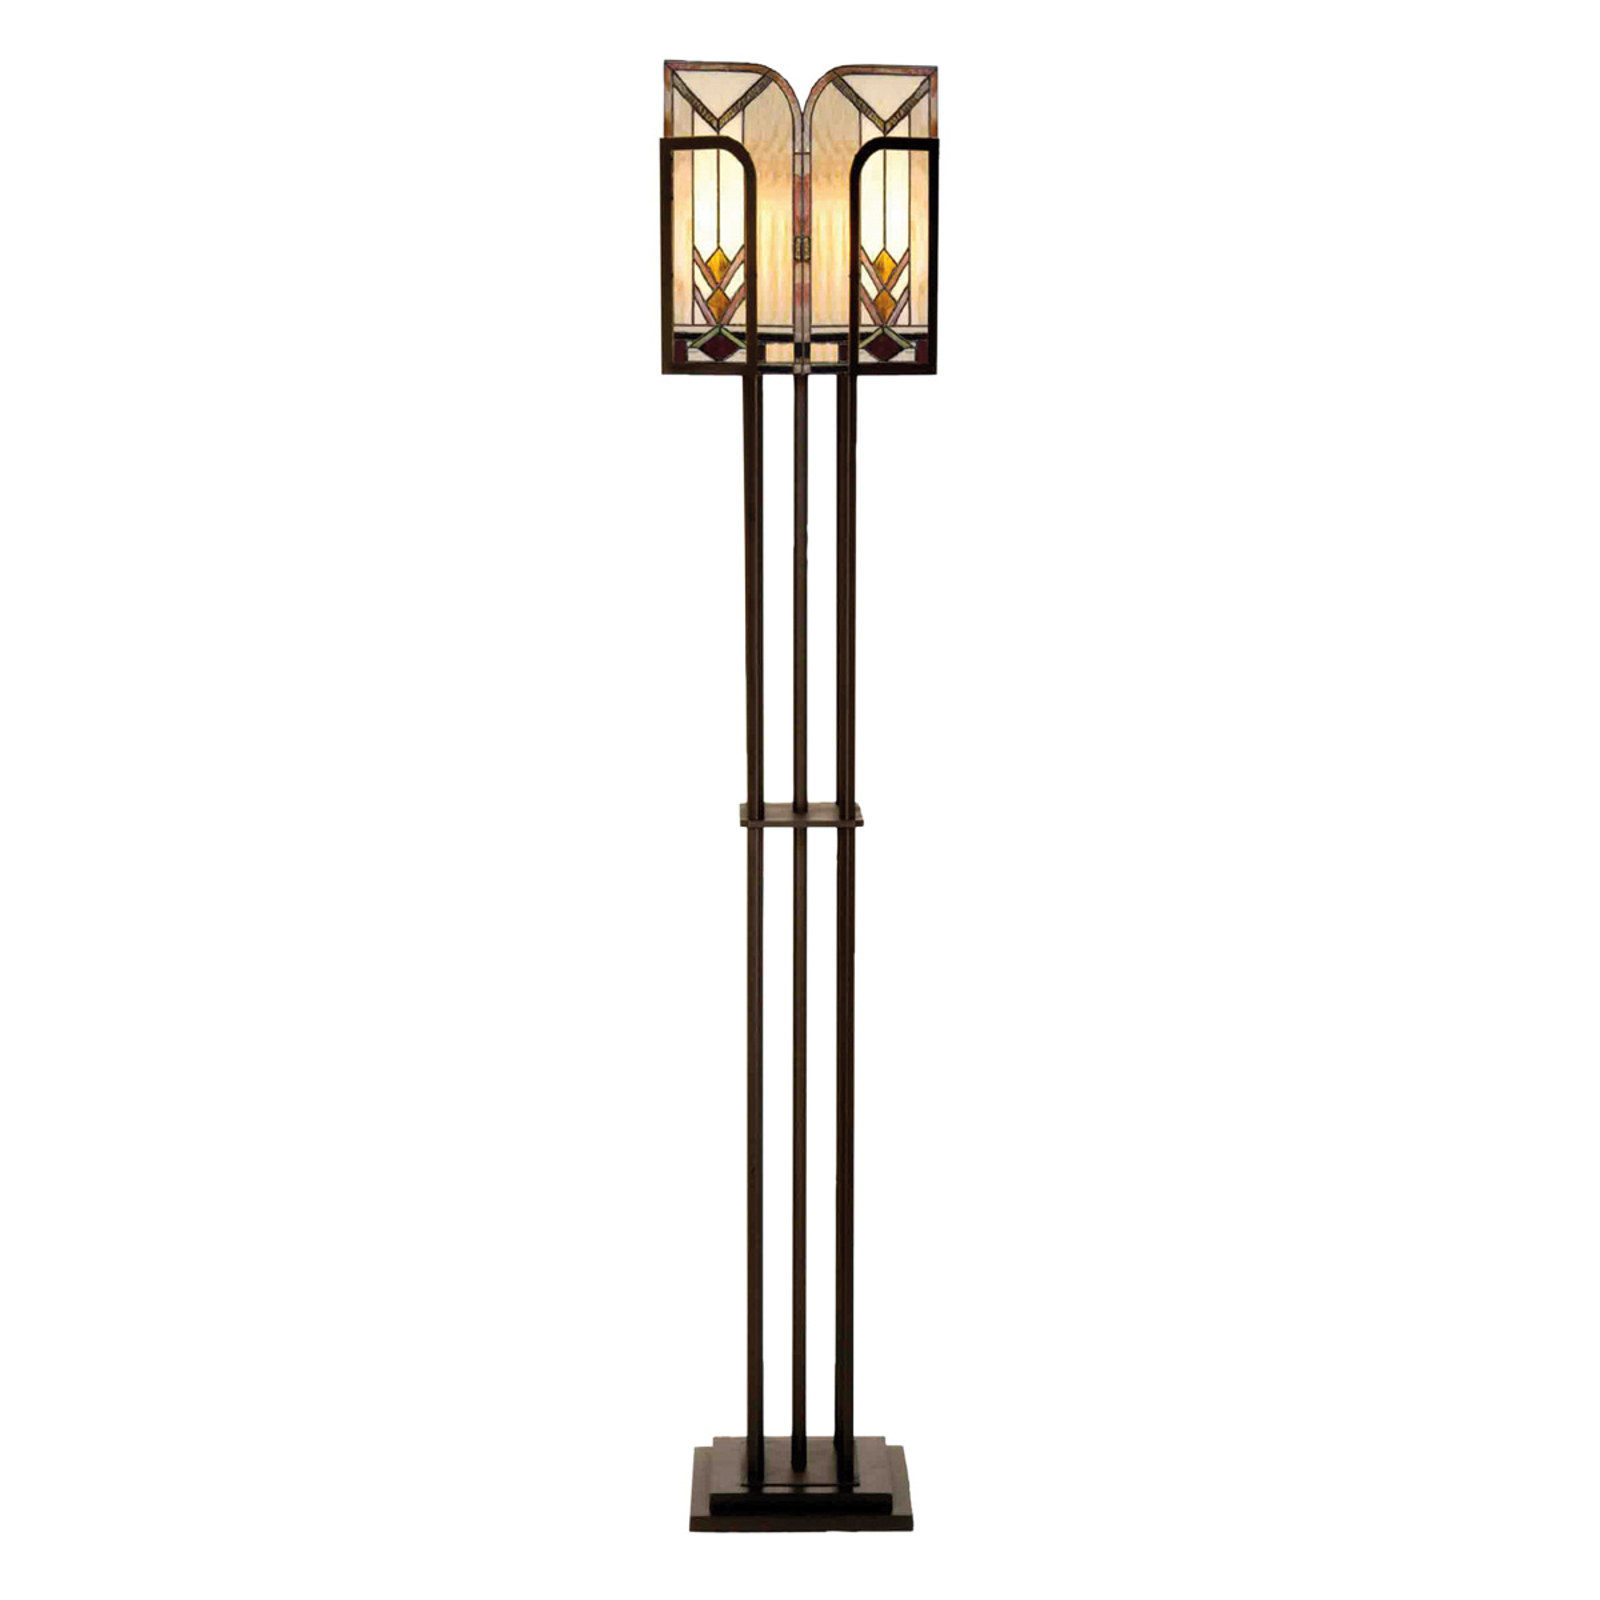 Madison standerlampe udformet i Tiffany-stil